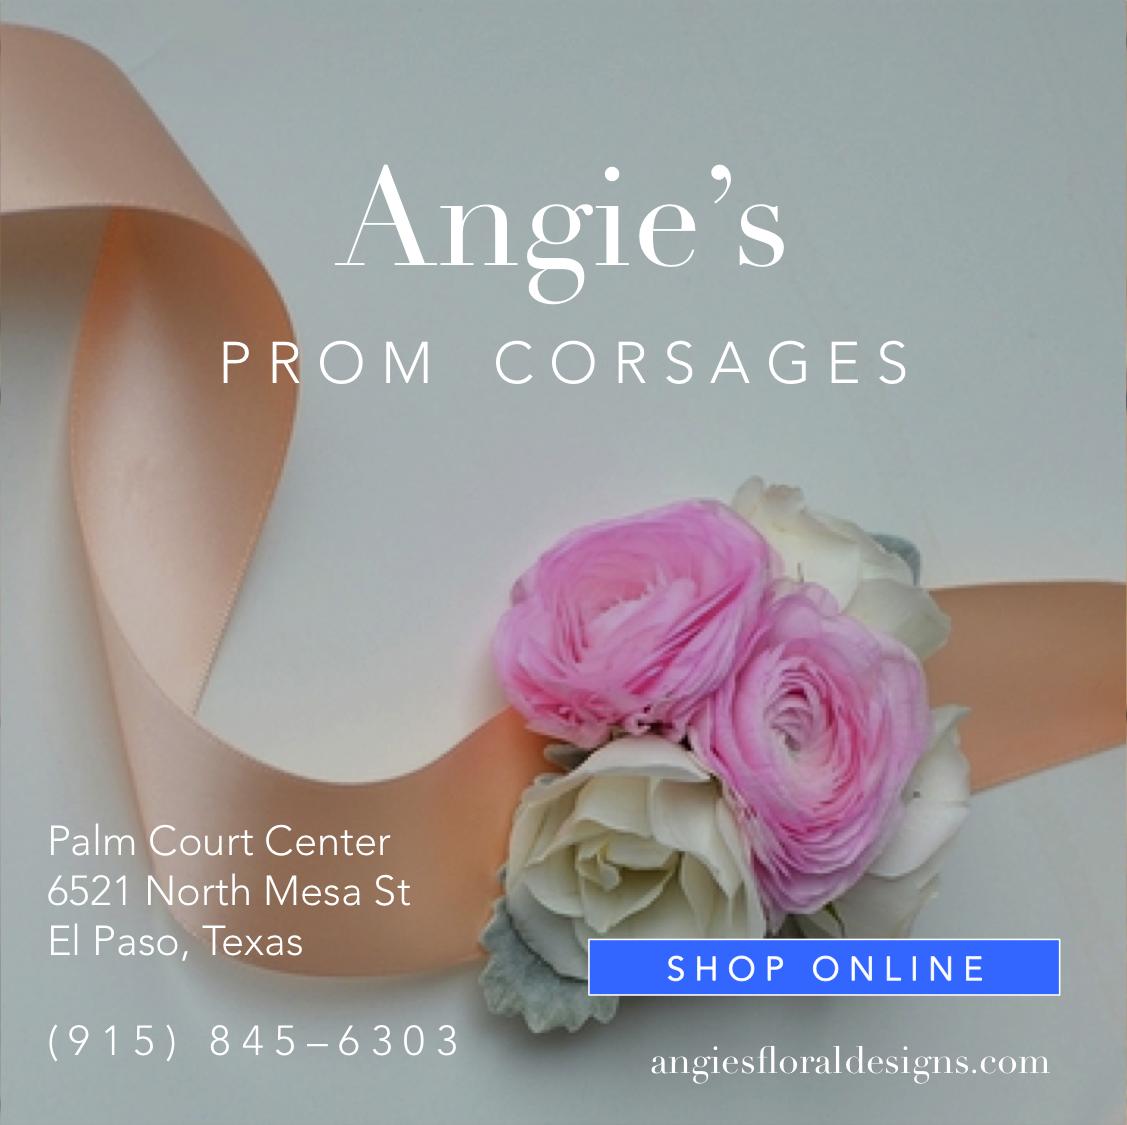 el-paso-florist-flowershop-angies-flower-prom-corsages-wrist-corsages-el-paso-texas-flowershop-79912-angies-floral-designs-wrist-corsages-wristlet-corsage-el-paso-prom-coronado-high-school-franklin-el-paso-high-school-prom.png